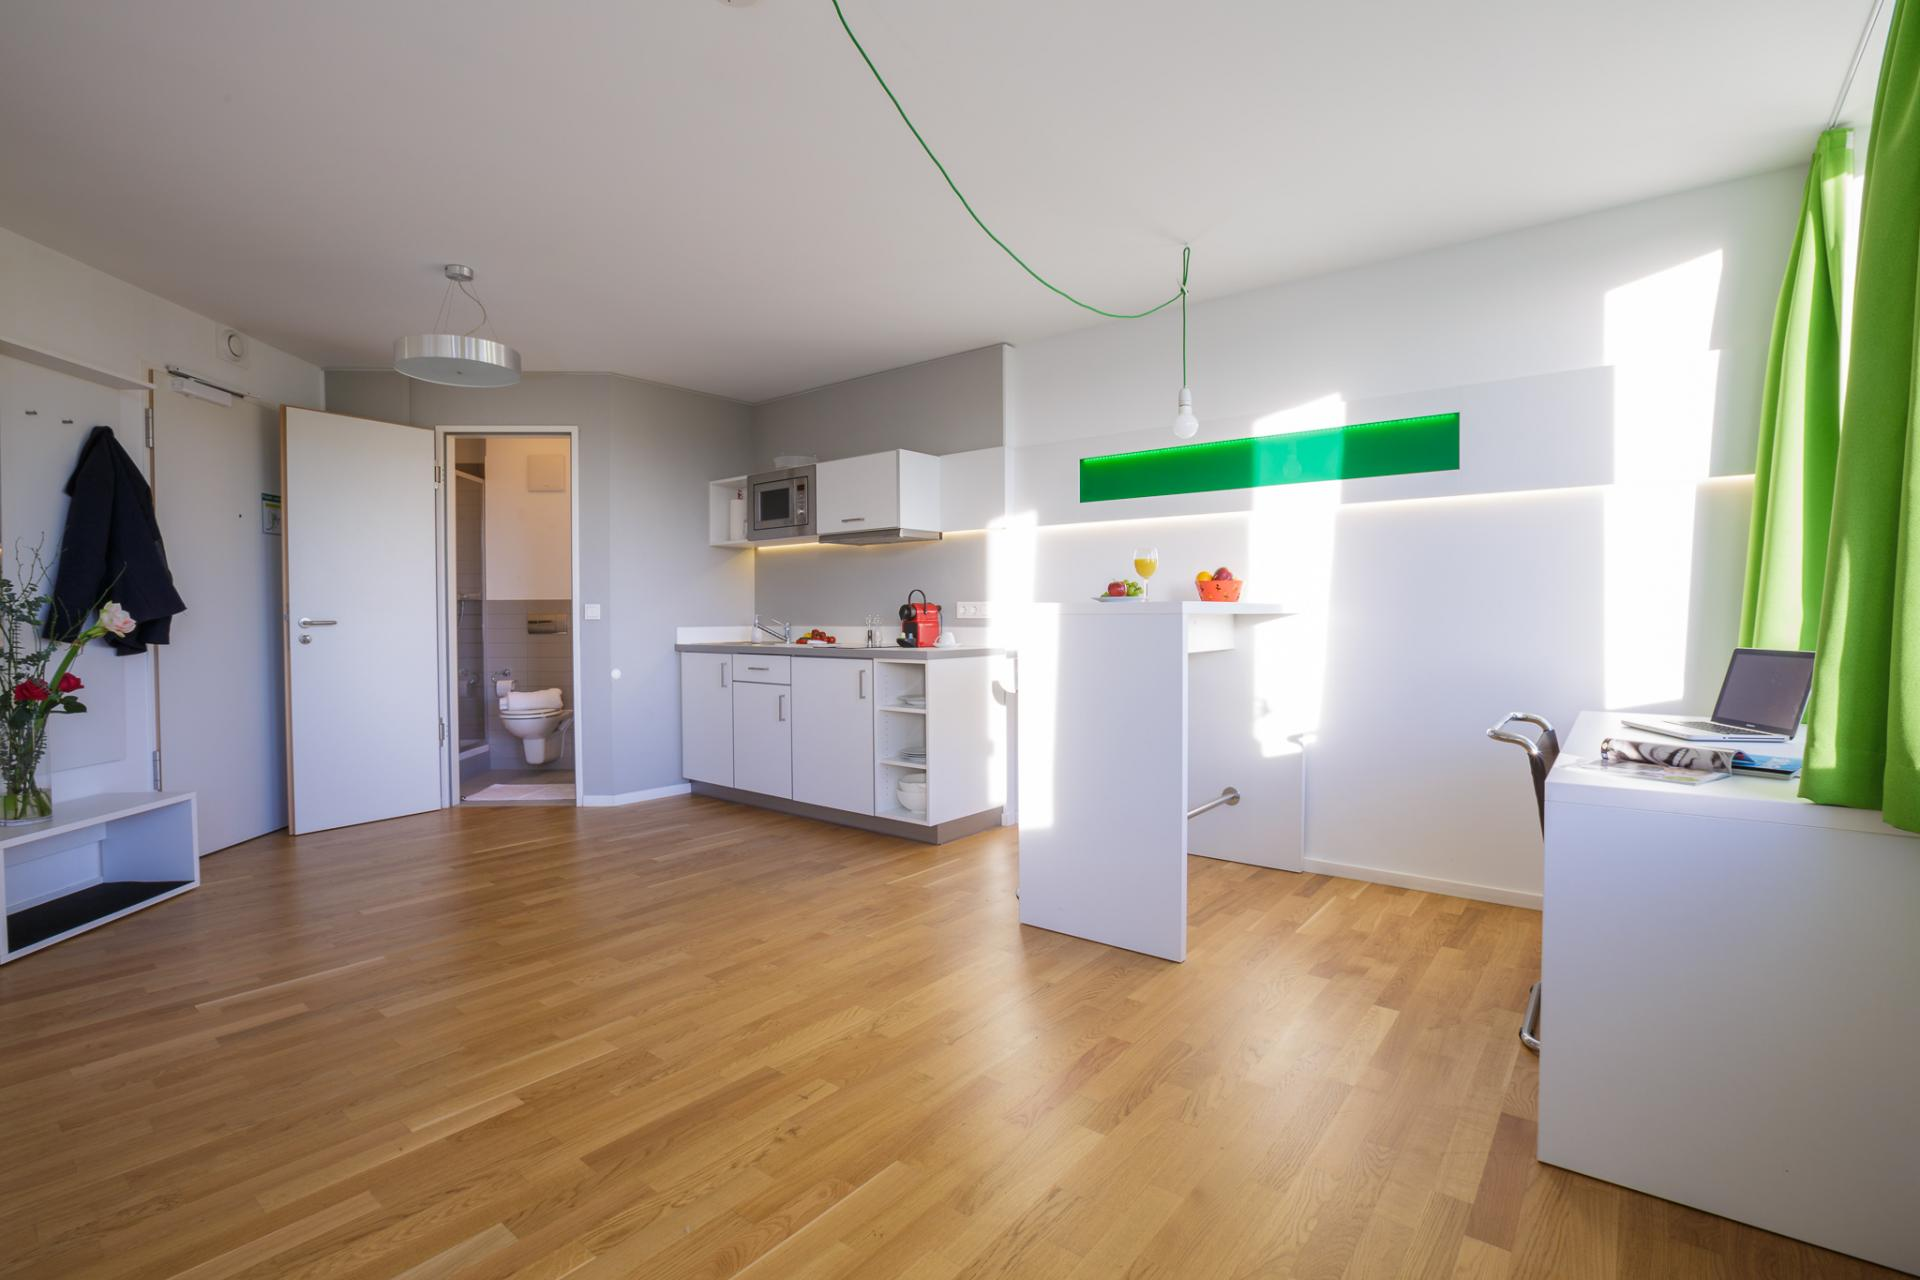 Studio at Brera Am Plaerrer 2 Apartments - Citybase Apartments